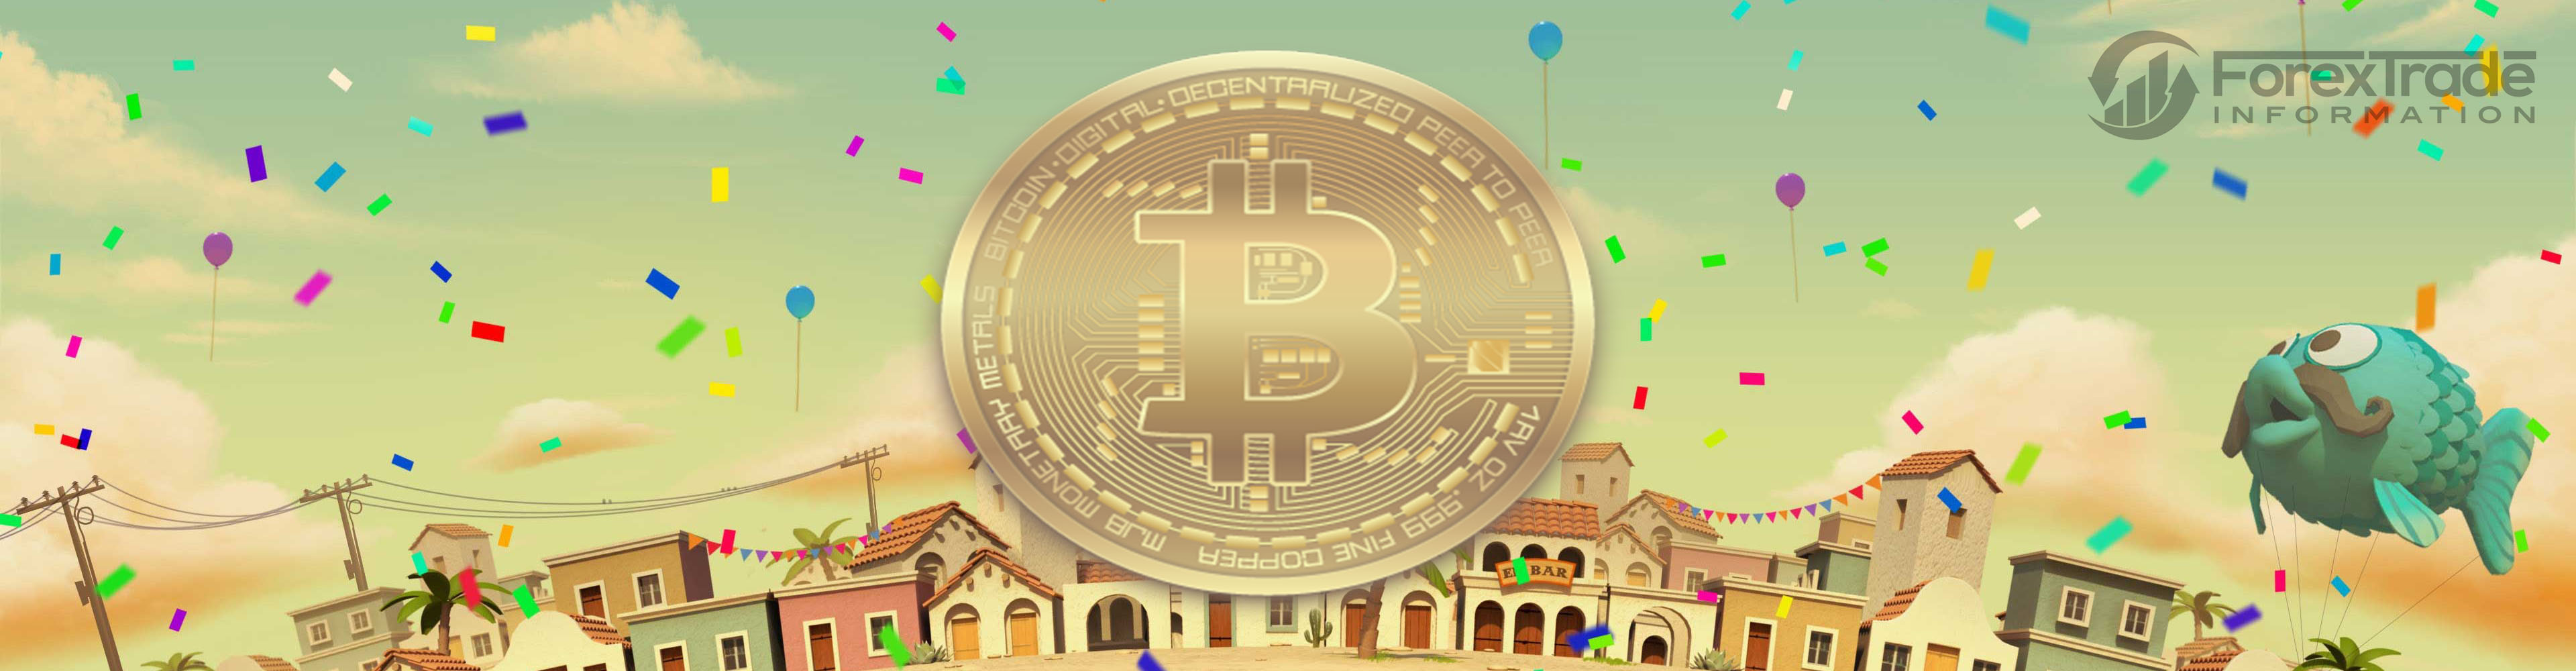 spinata grande bitcoin